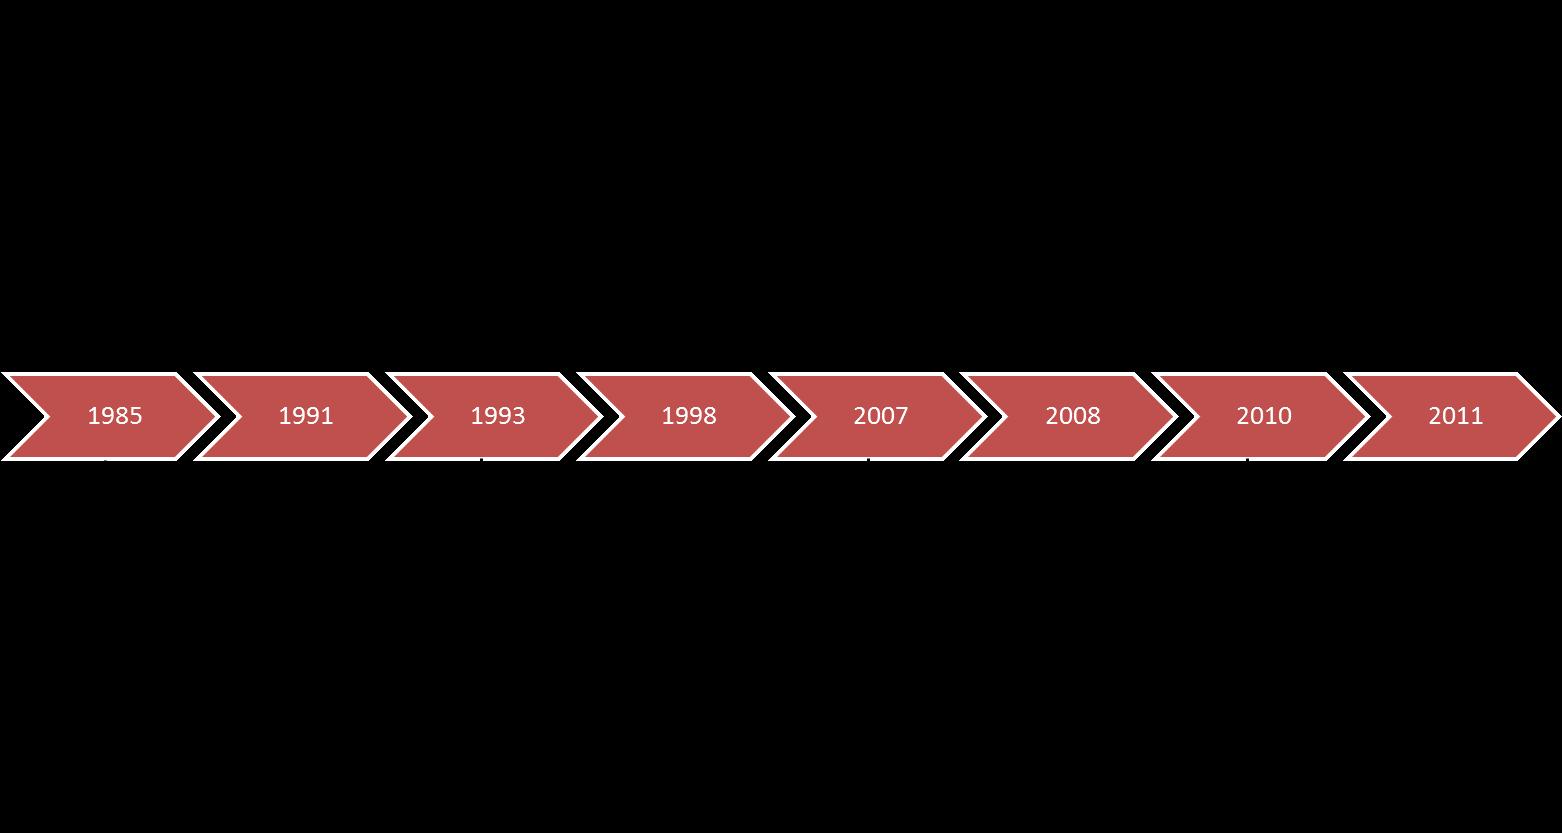 Mold Tek Packaging History